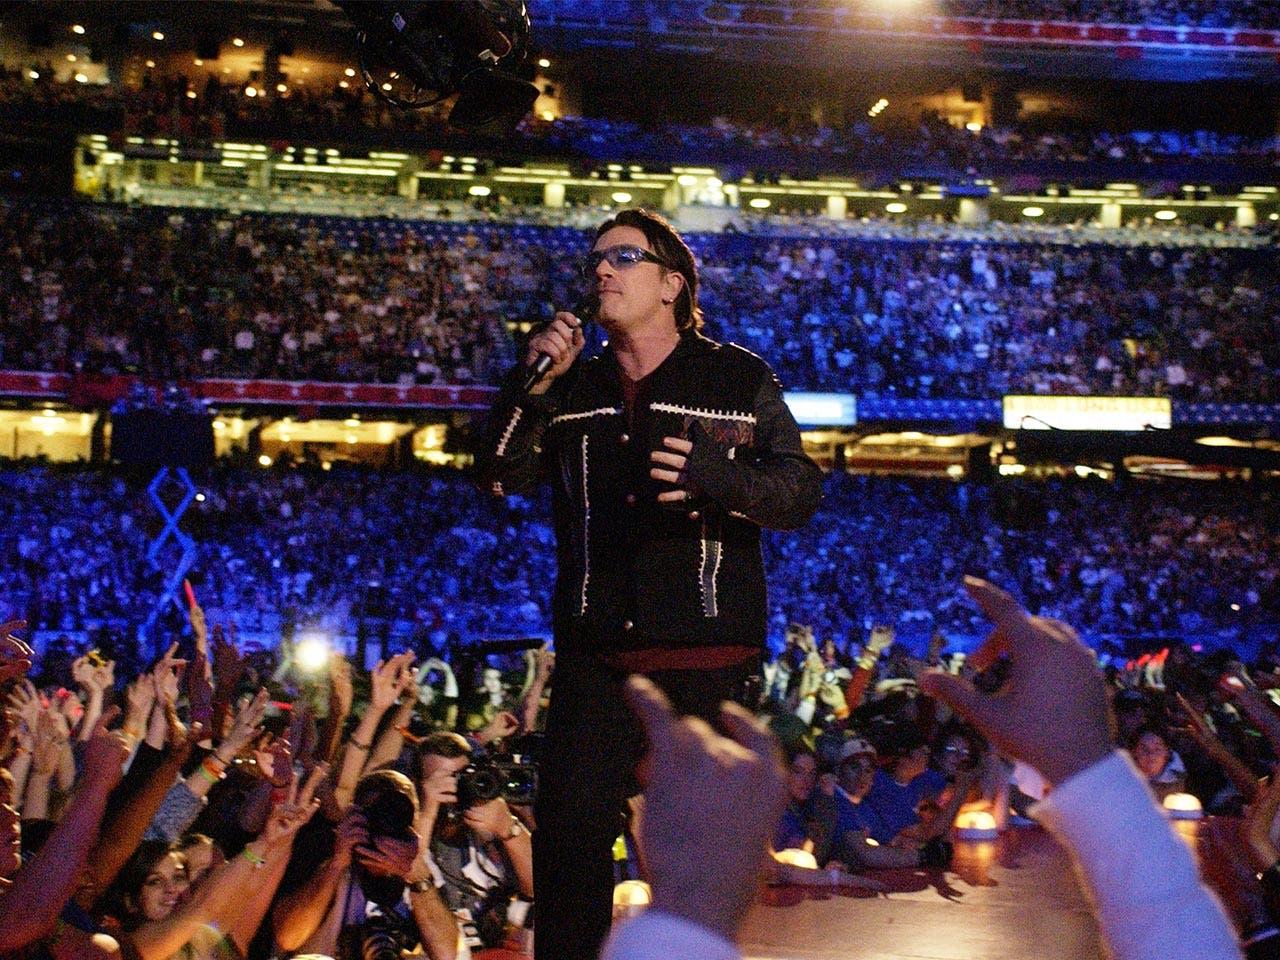 Bono | KMazur/Getty Images